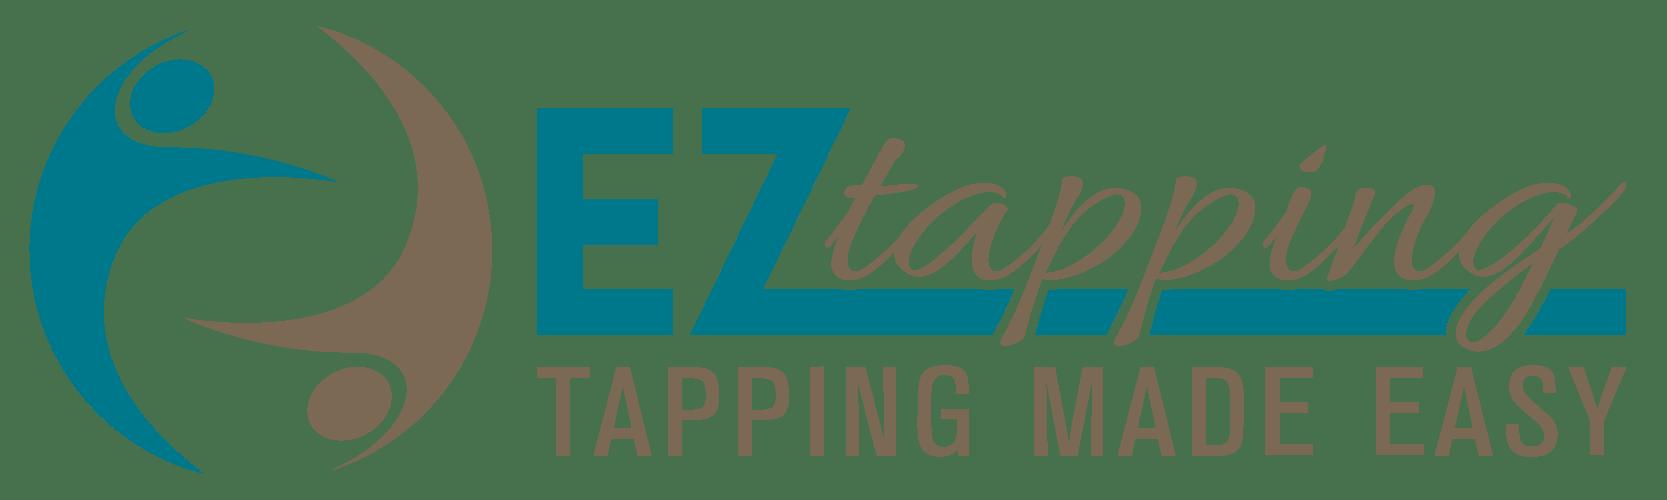 EZTAPPING